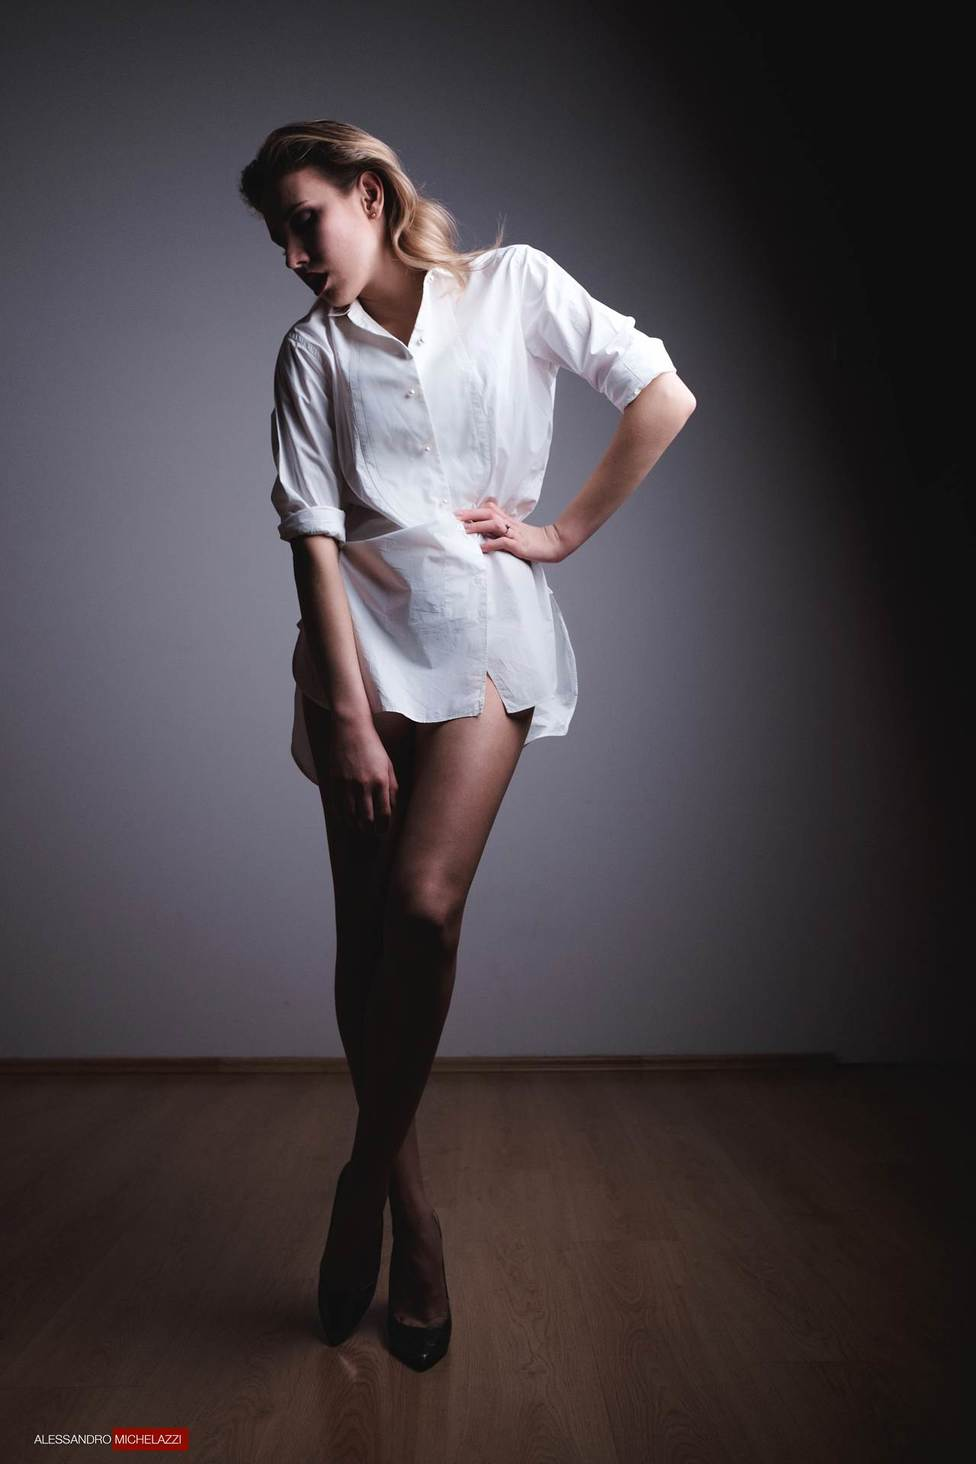 Alessandro-Michelazzi-Photography-X70-Fashion-Test-10